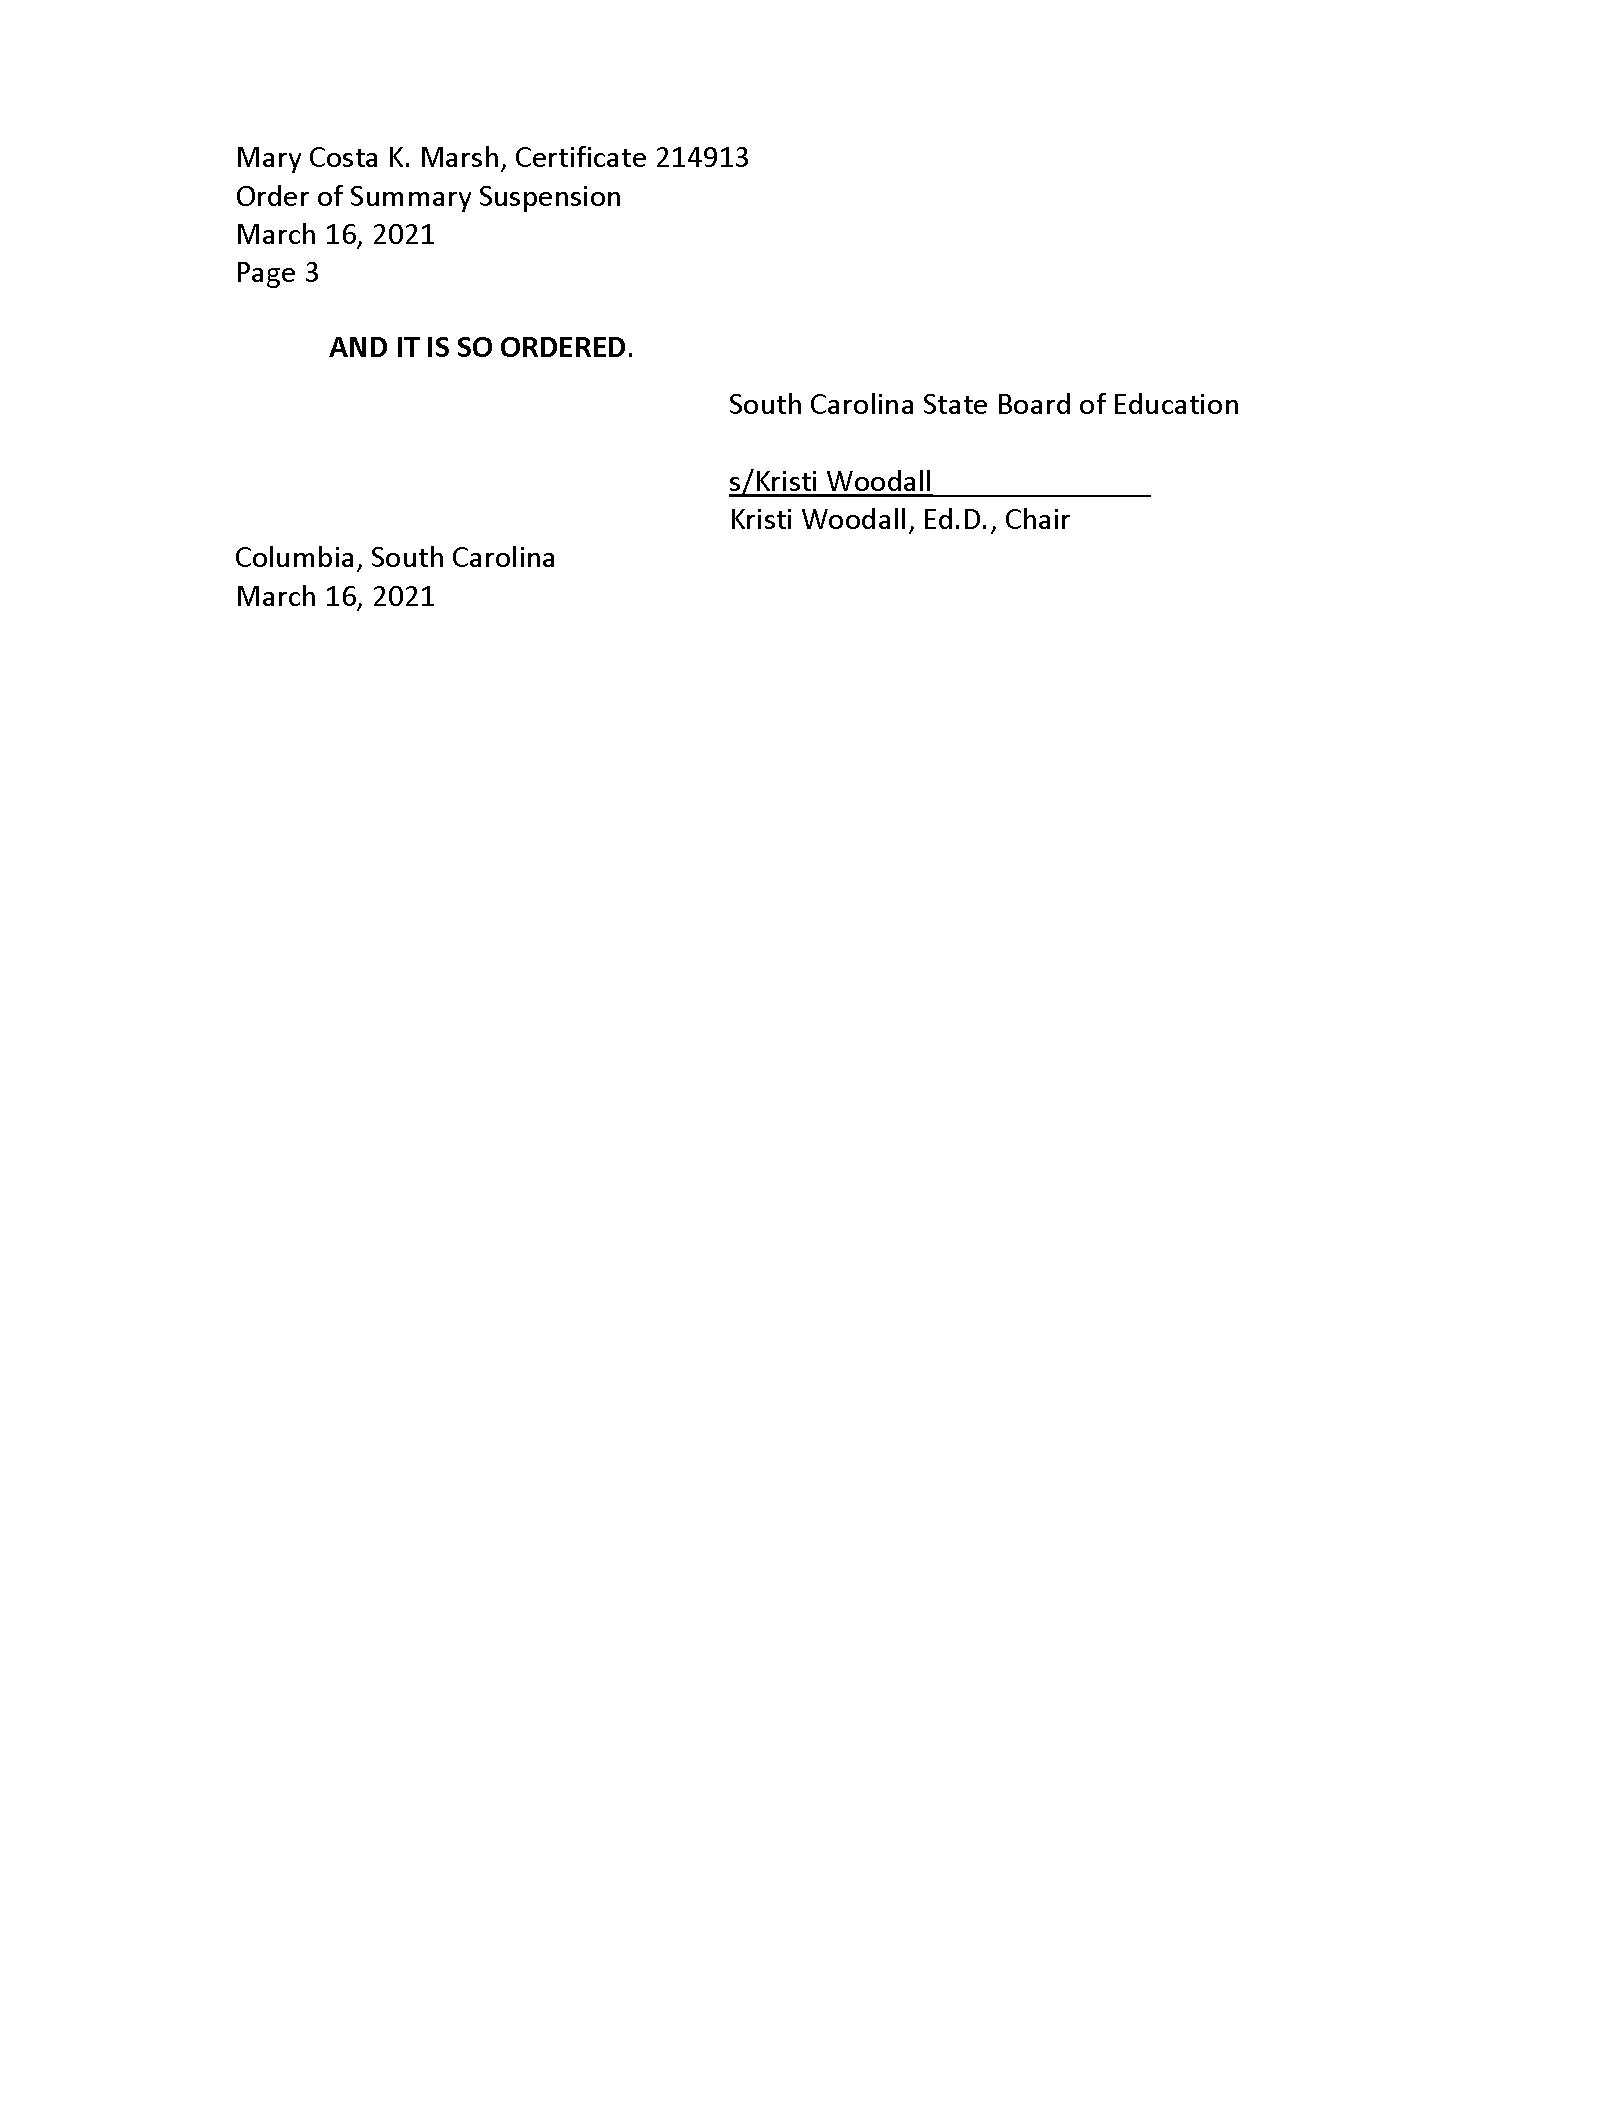 Copy of 2021-03-23_0-12-503.png